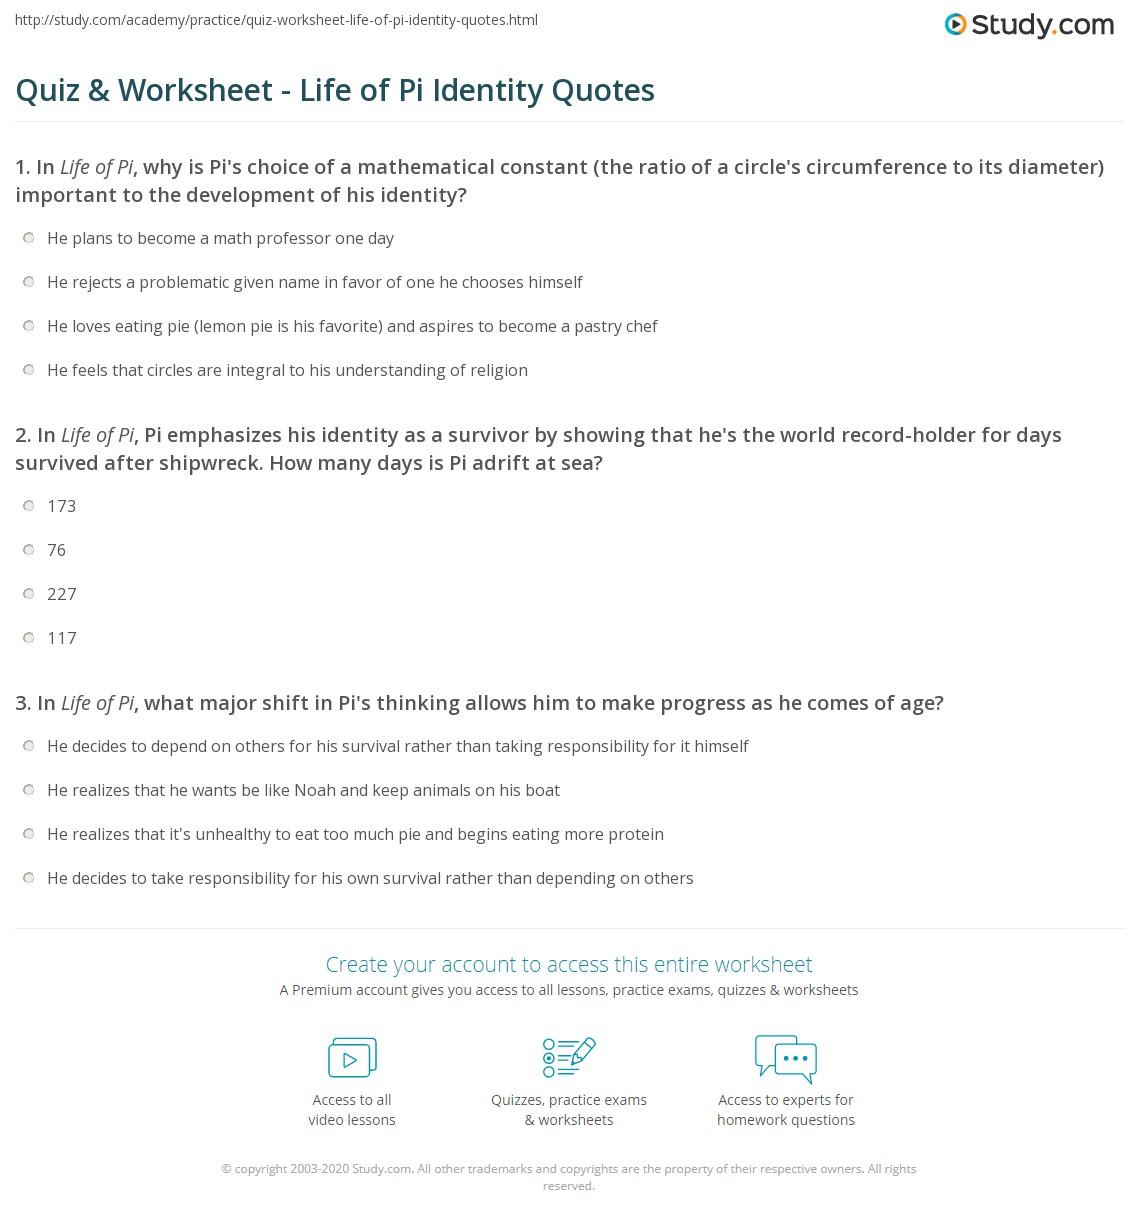 Quiz Worksheet Life Of Pi Identity Quotes Studycom